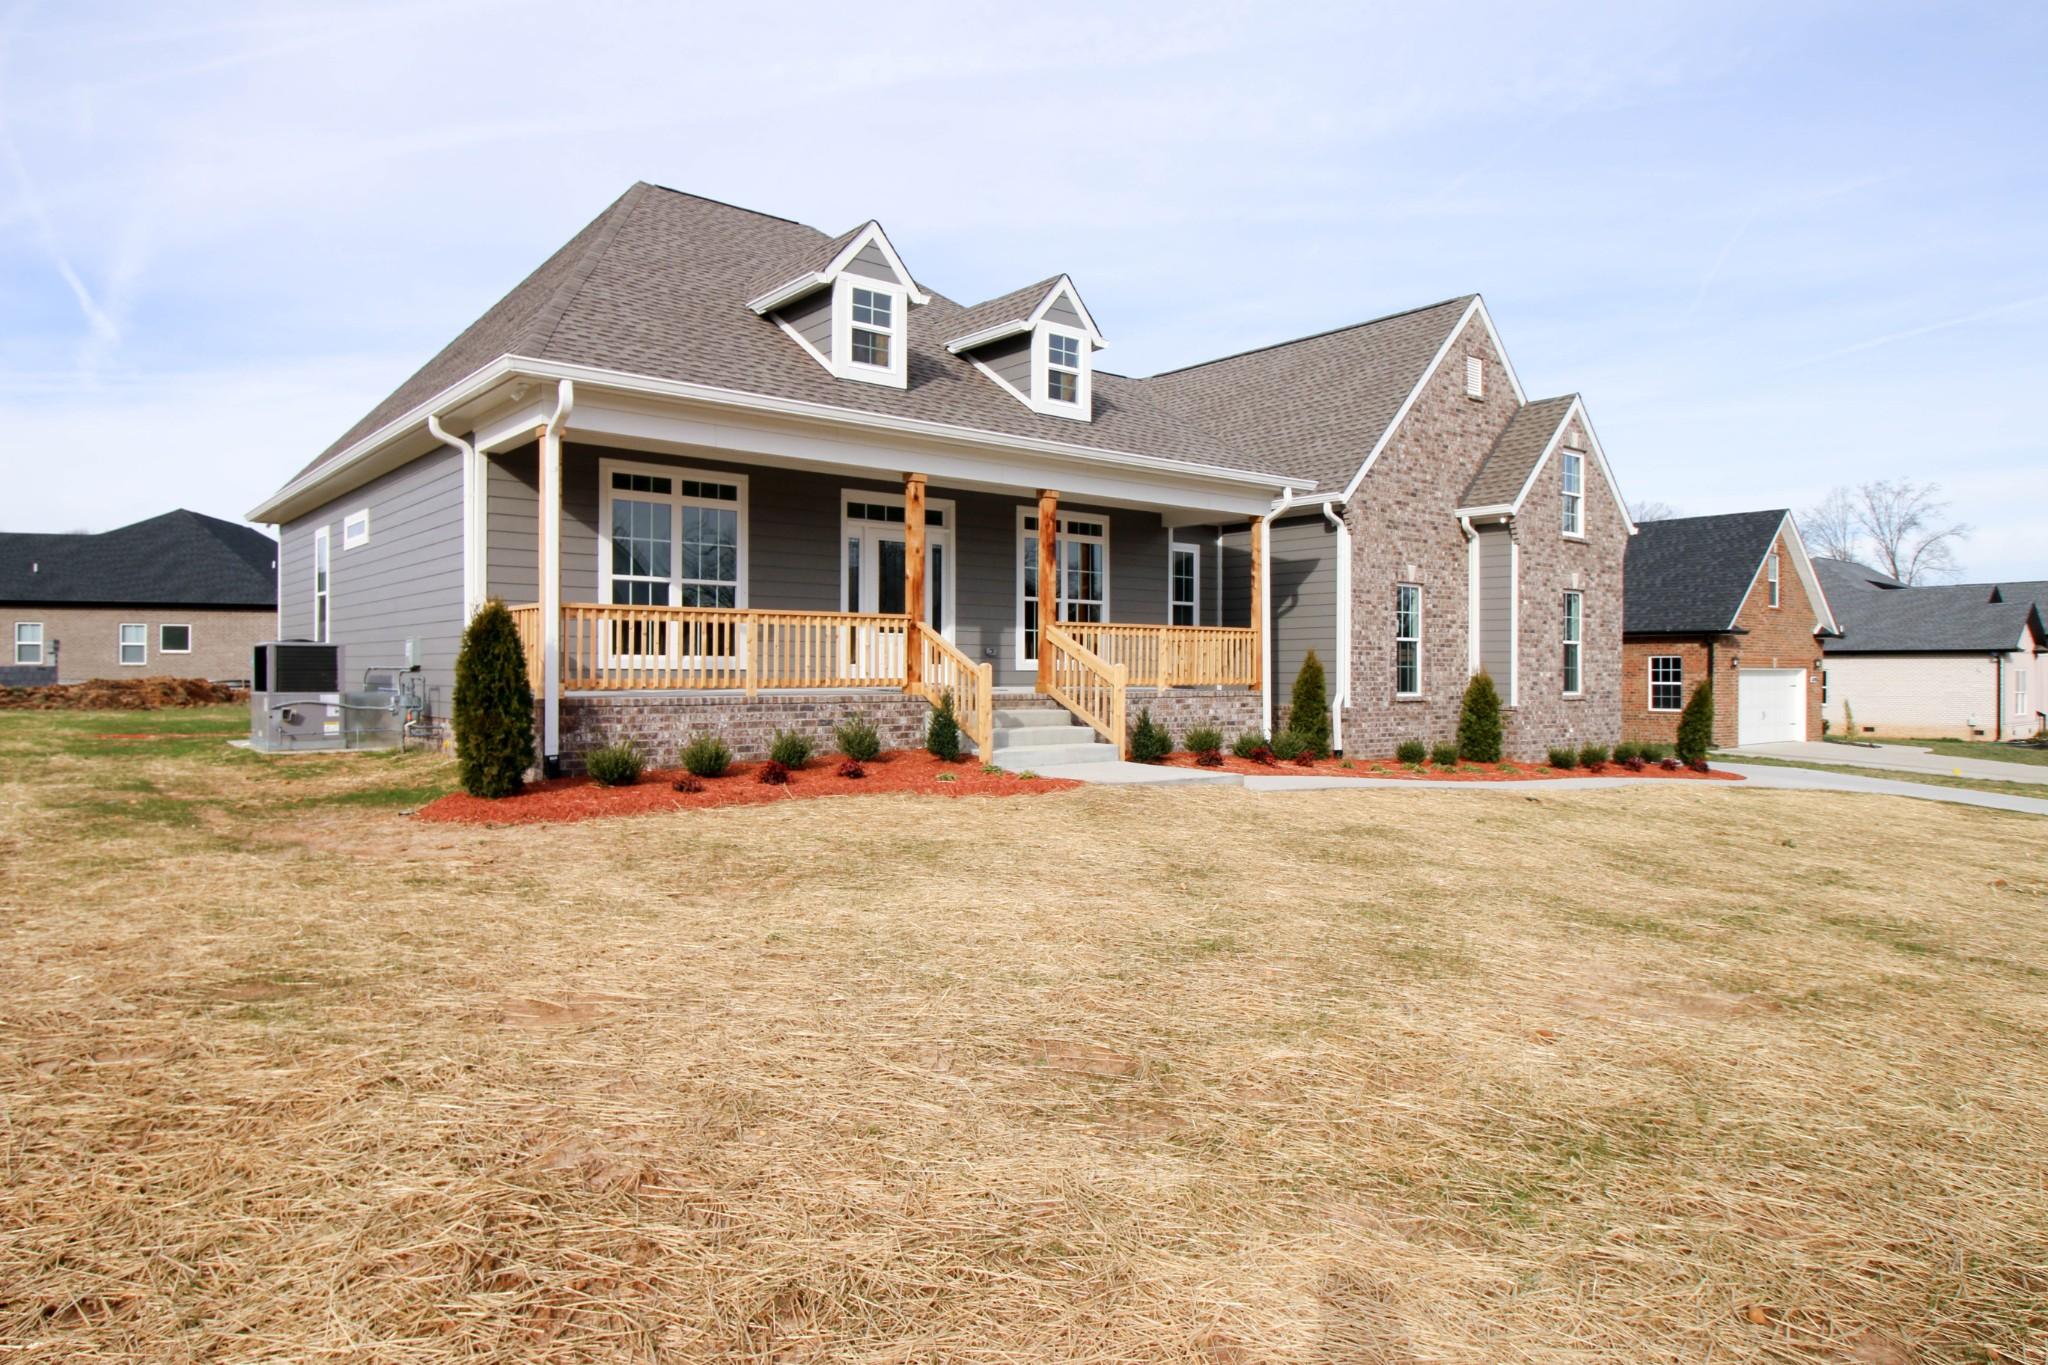 4369 Memory Ln, Adams, TN 37010 - Adams, TN real estate listing